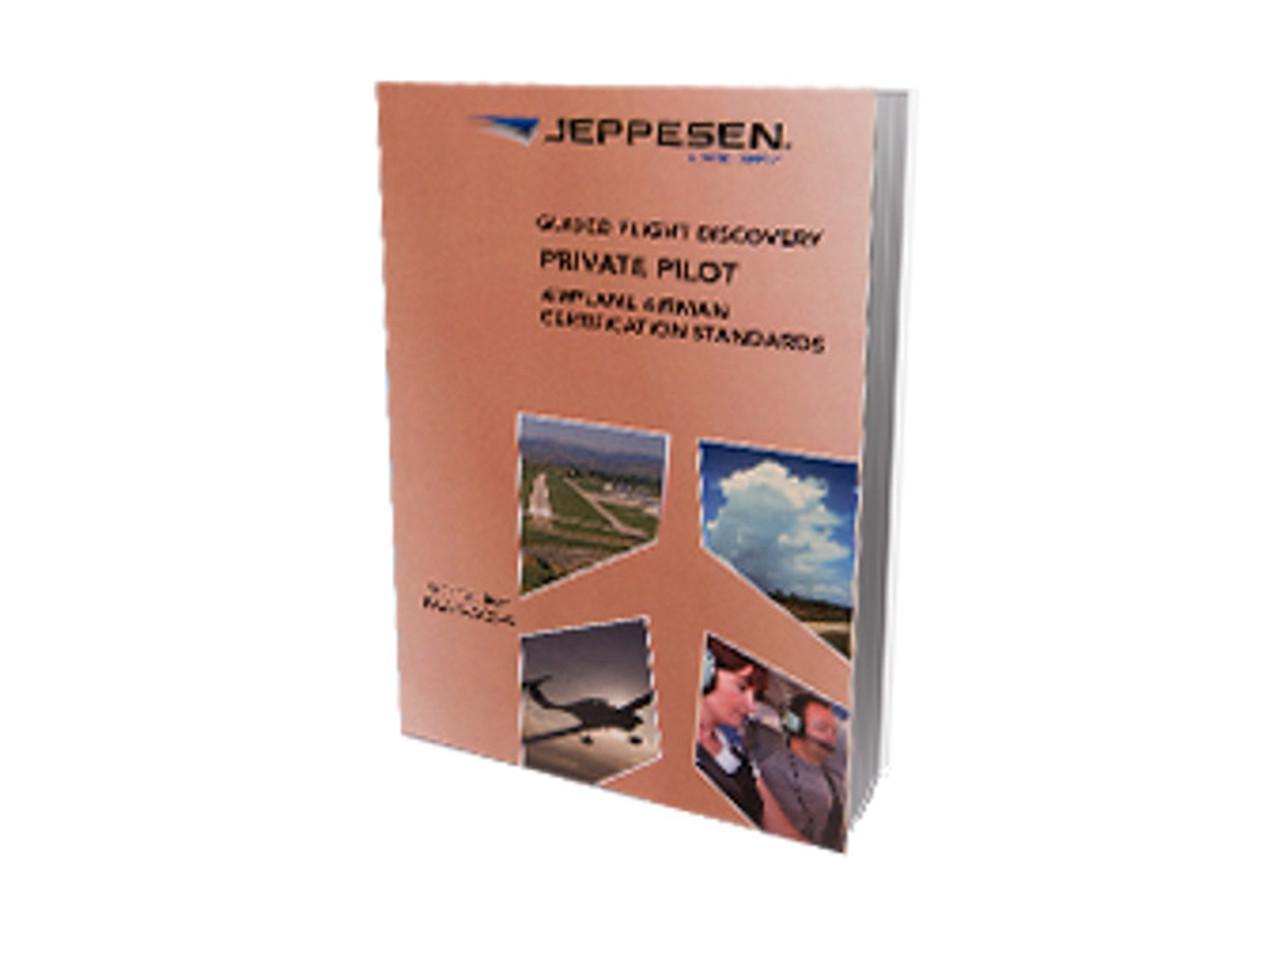 Jeppesen Private Pilot Airman Certification Standards (ACS) 10735871-002